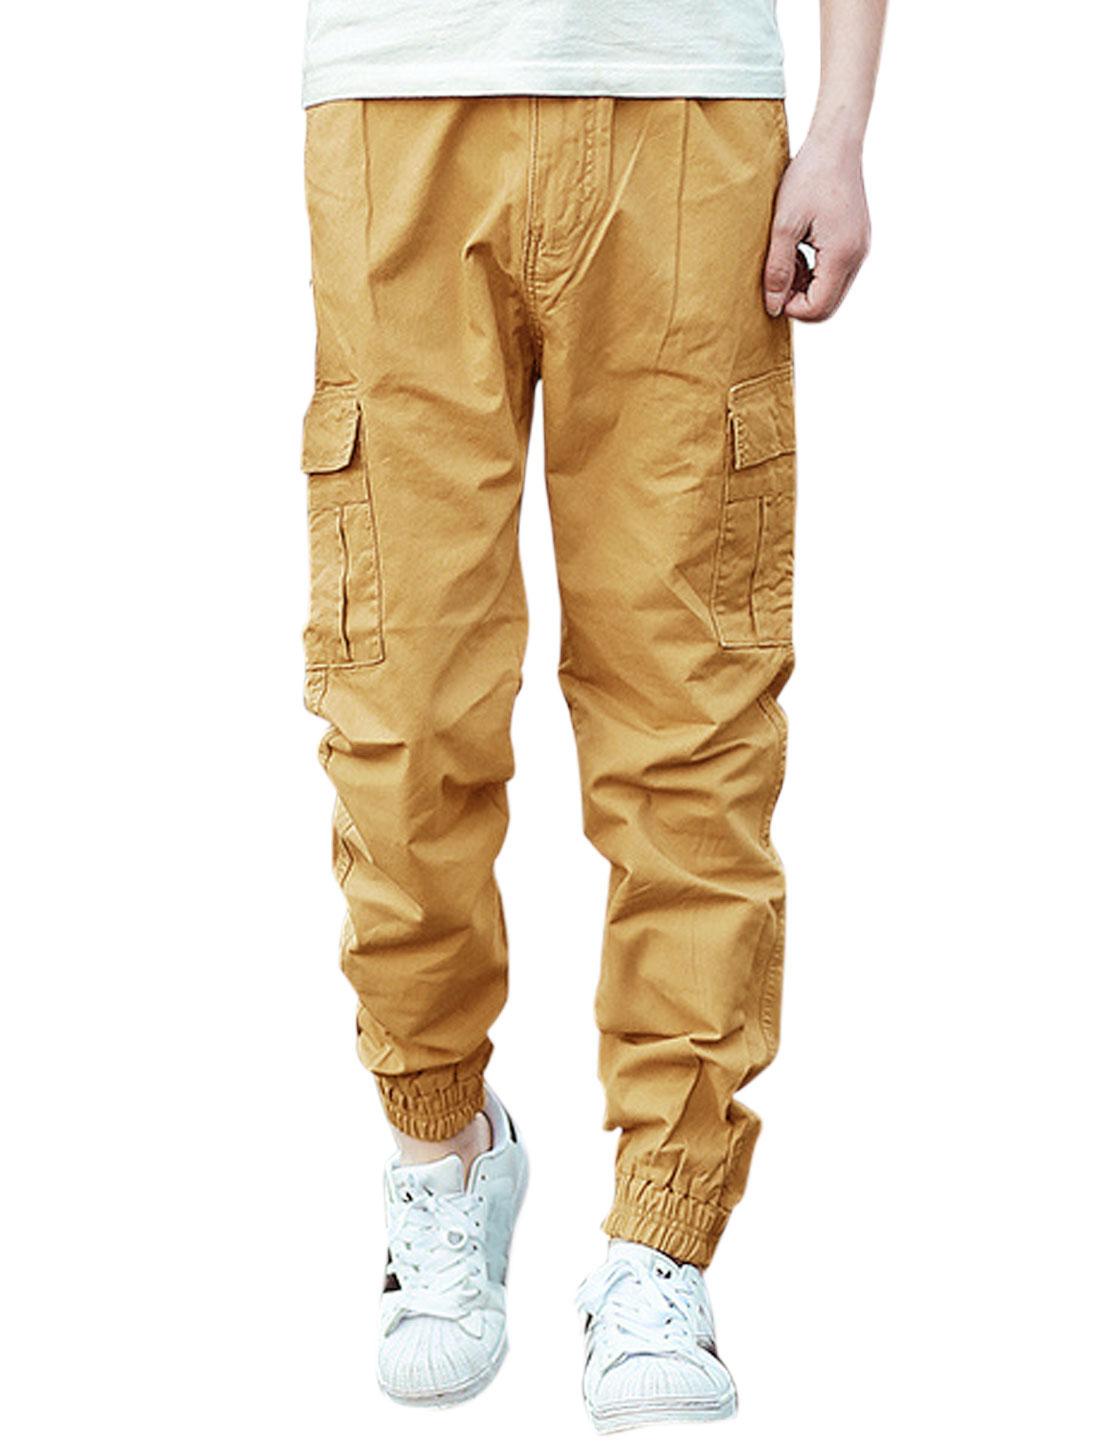 Men Two Cargo Pockets Elastic Cuffs Zip Fly Casual Pants Khaki W32